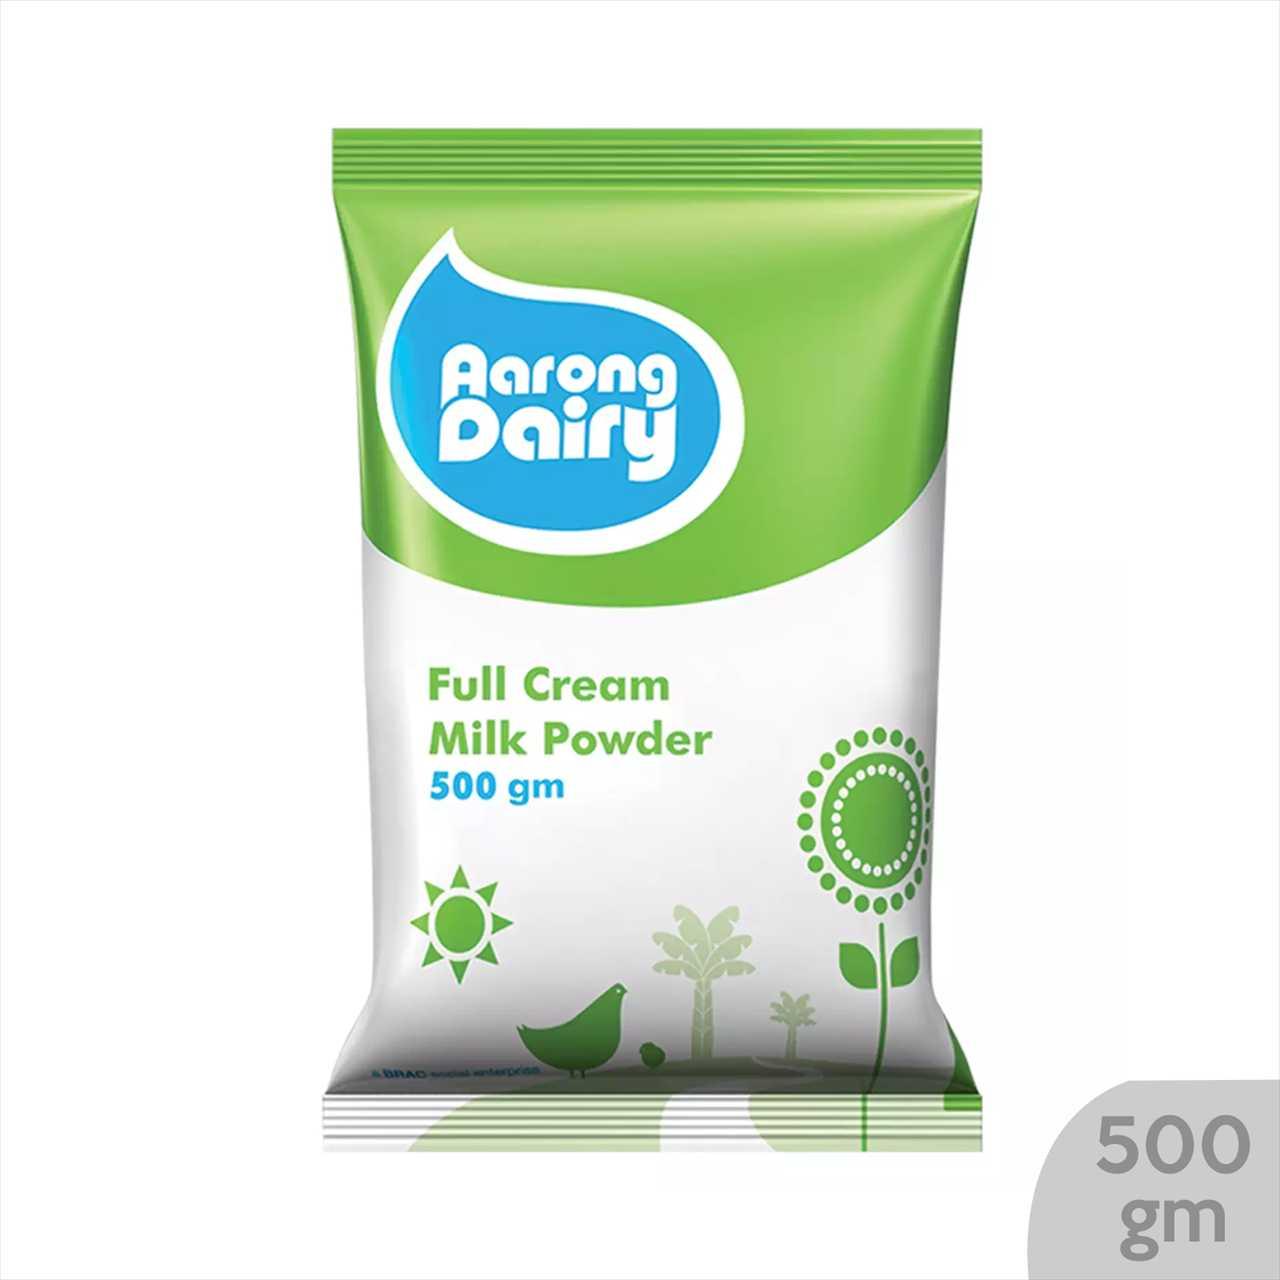 Aarong Dairy Full Cream Milk Powder 500 gm